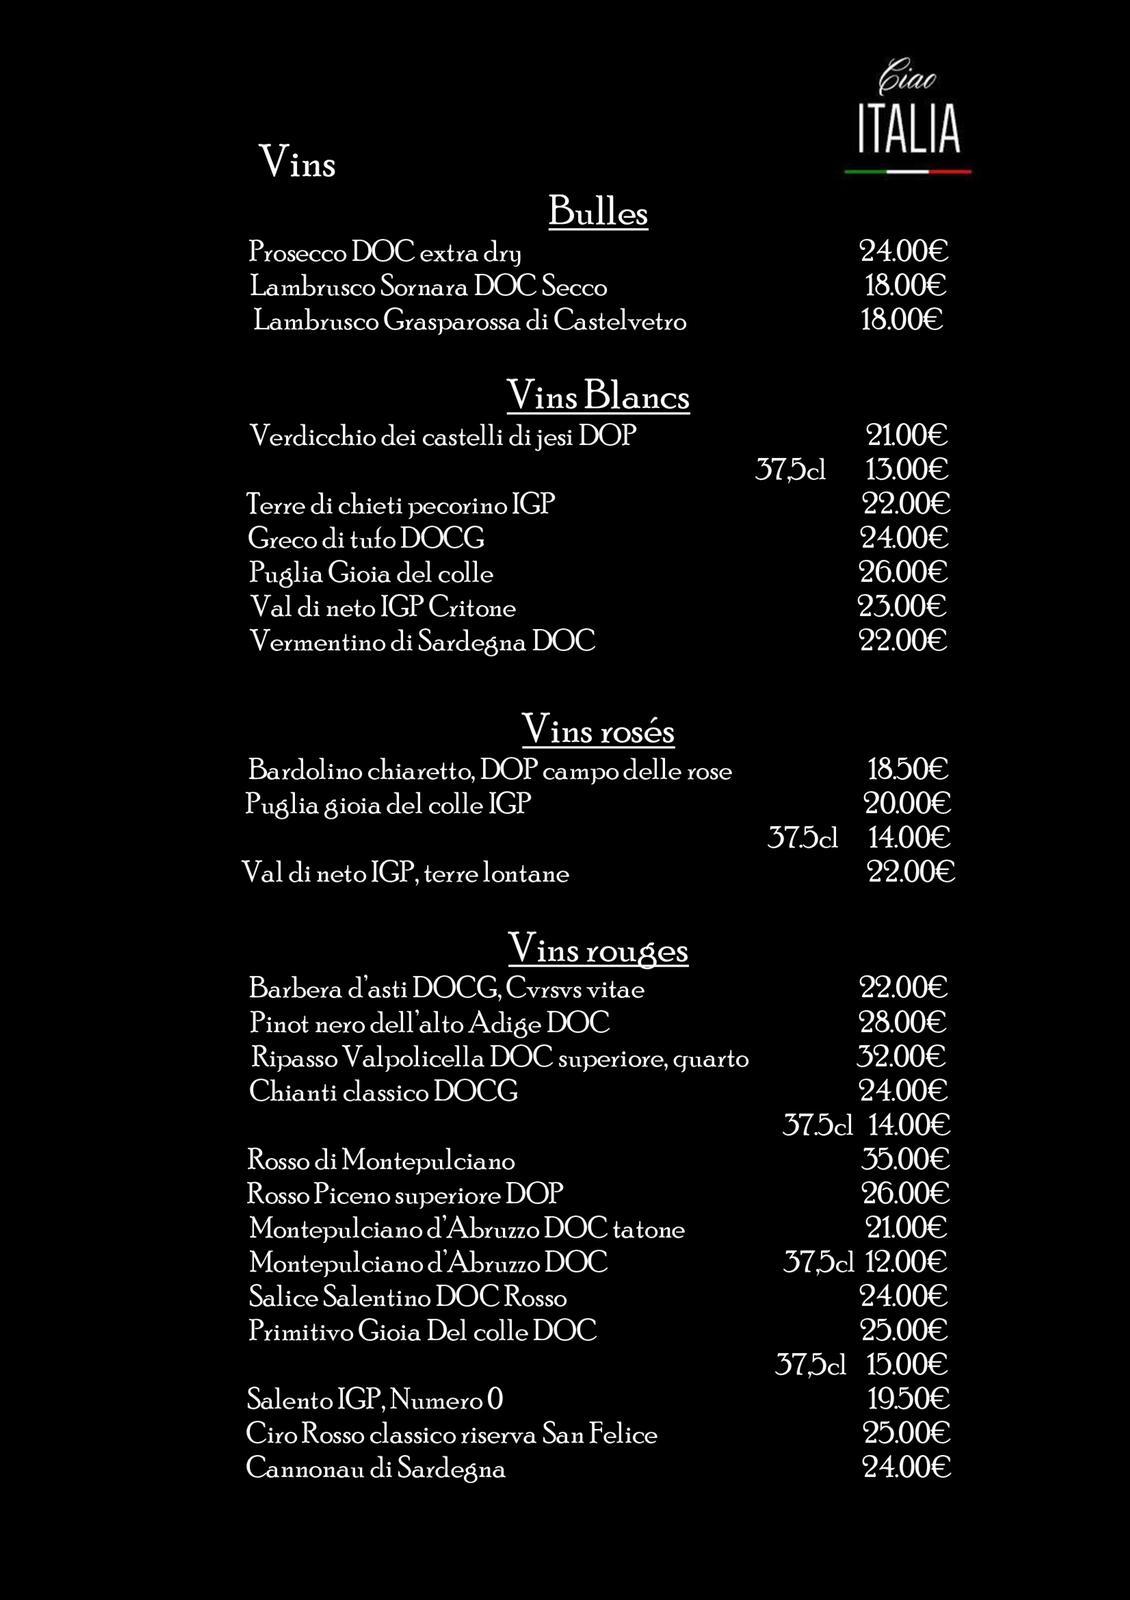 carte-ciaoitalia-401-vins